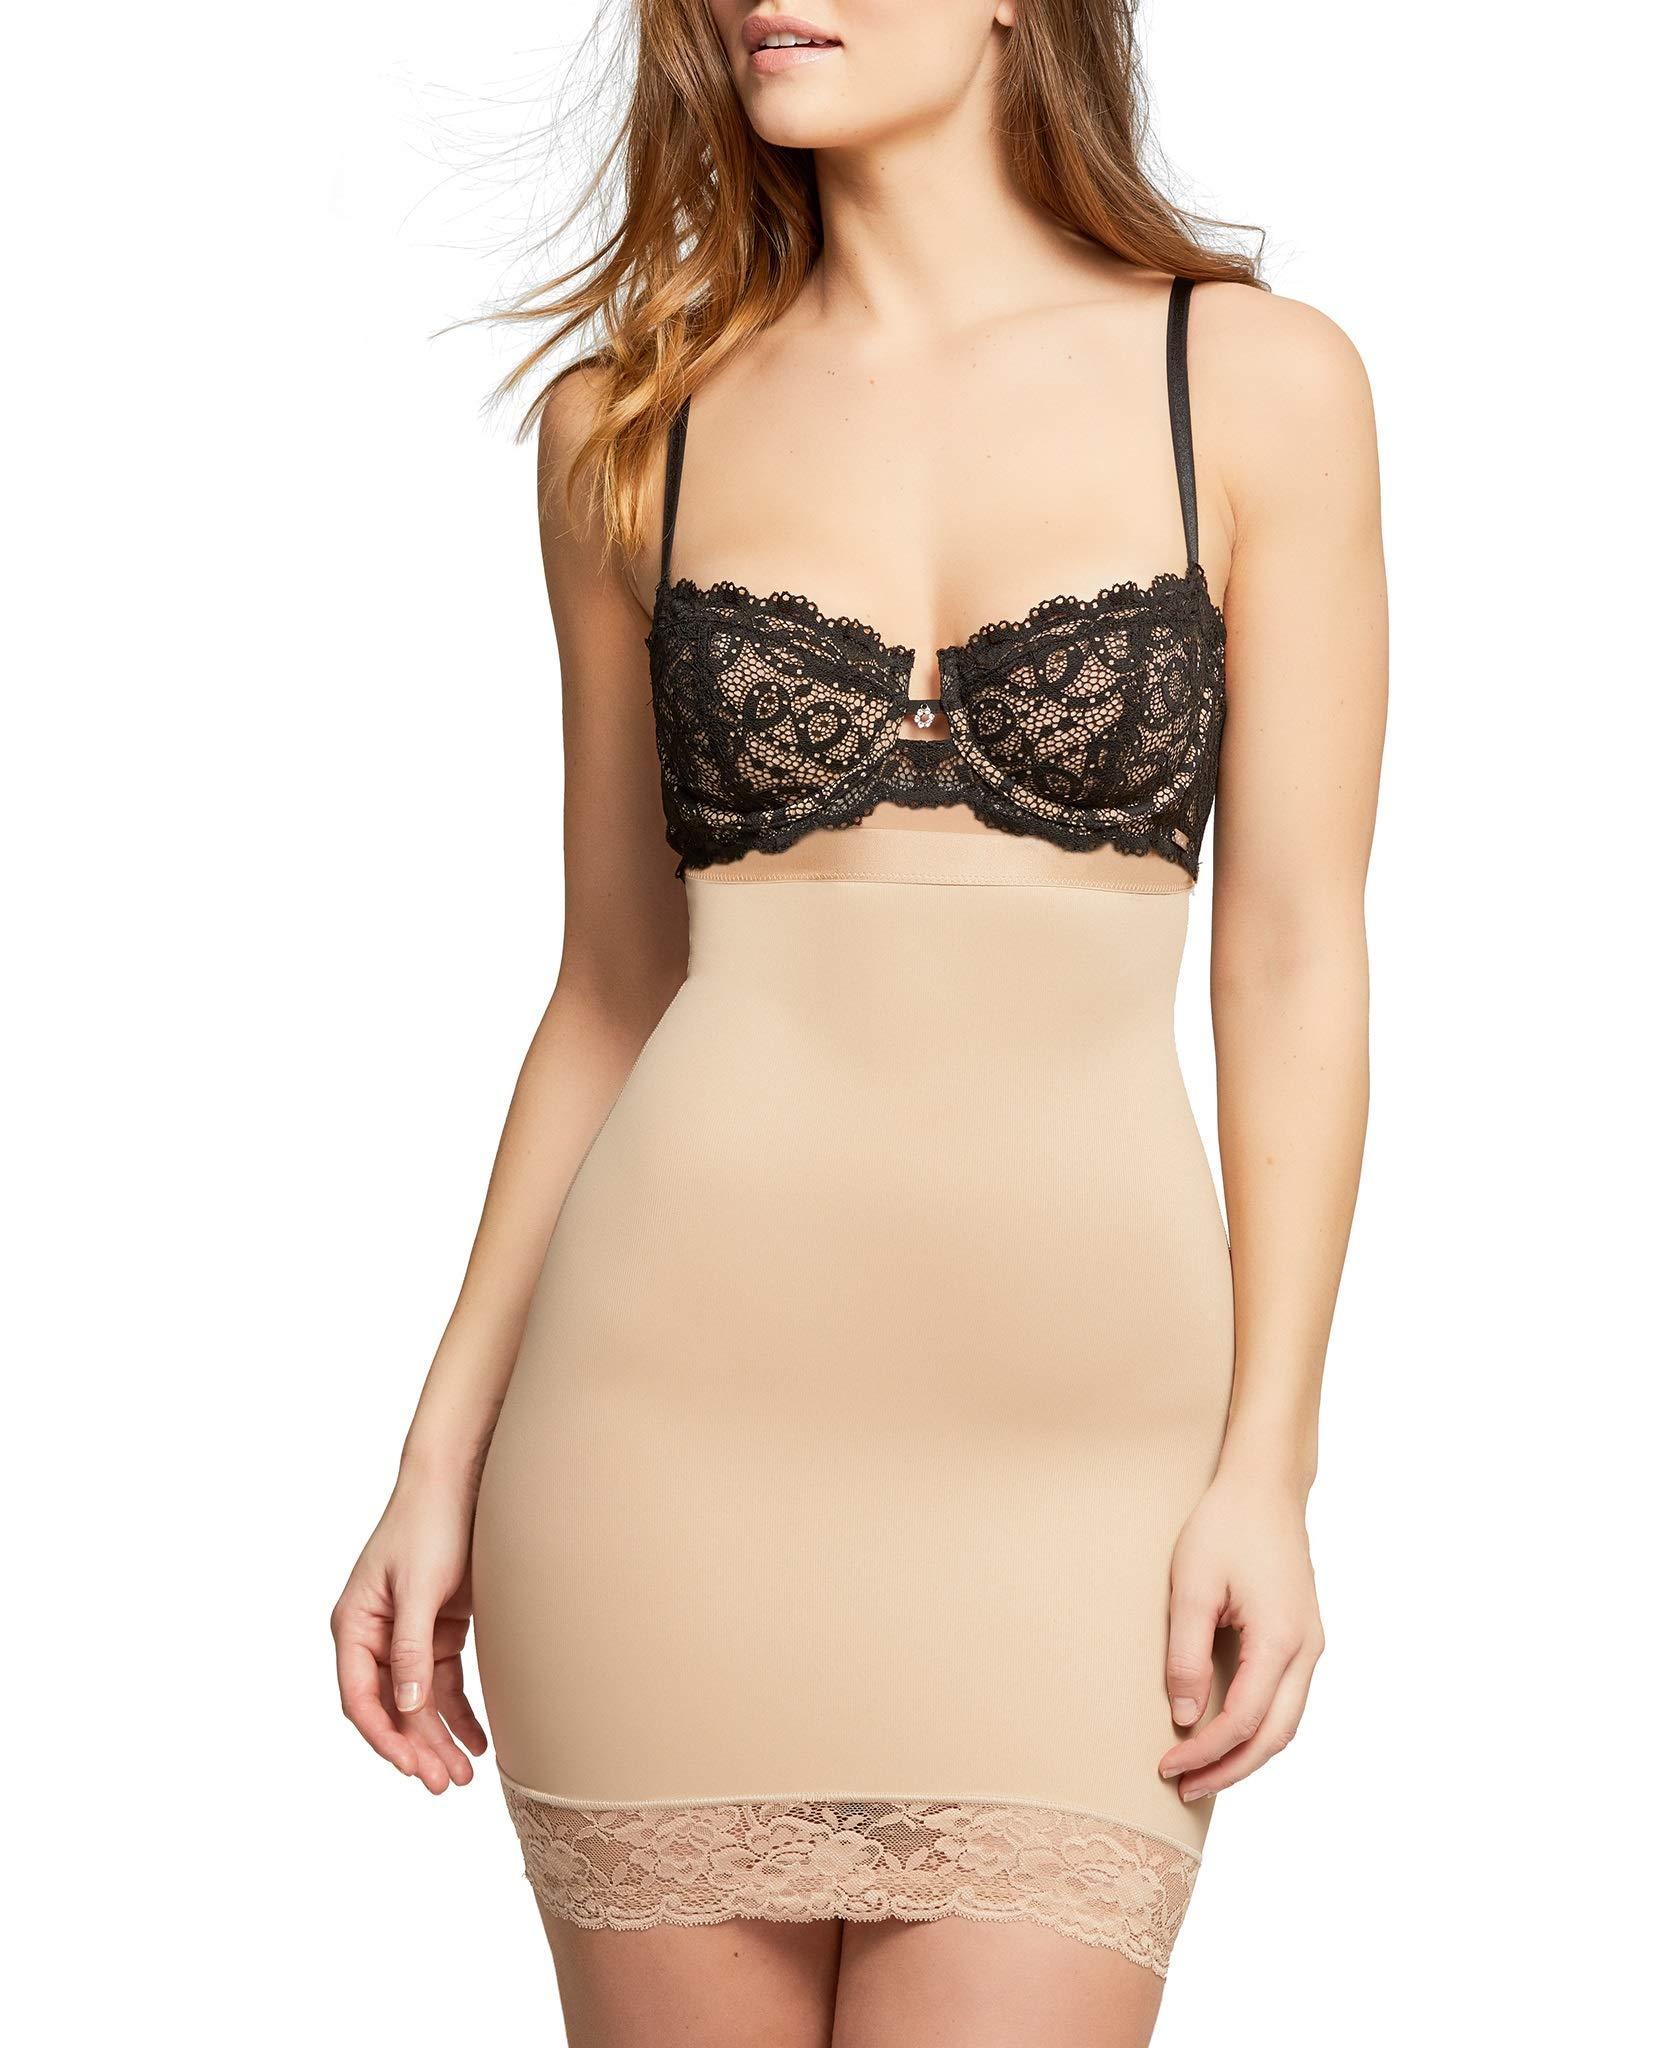 Montelle Women's Plus Size Strapless Shapewear Firm Tummy Control Waist Body Shaper Slip